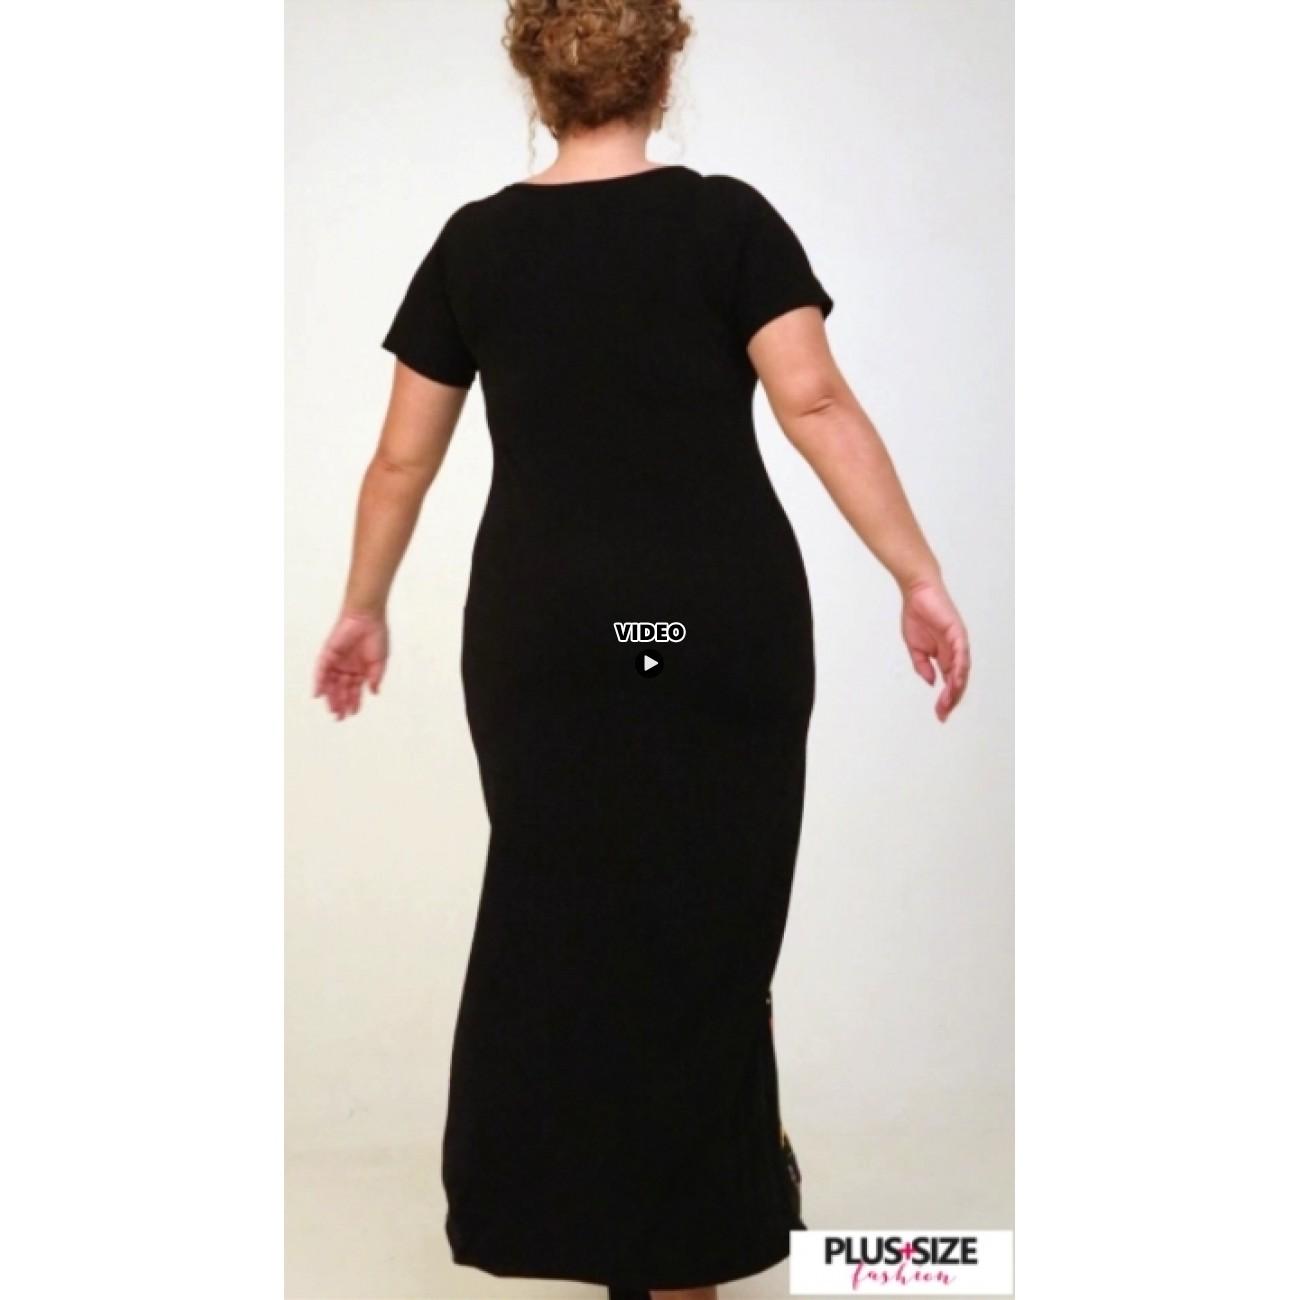 A21-8823FK Long Jersey Dress with pattern